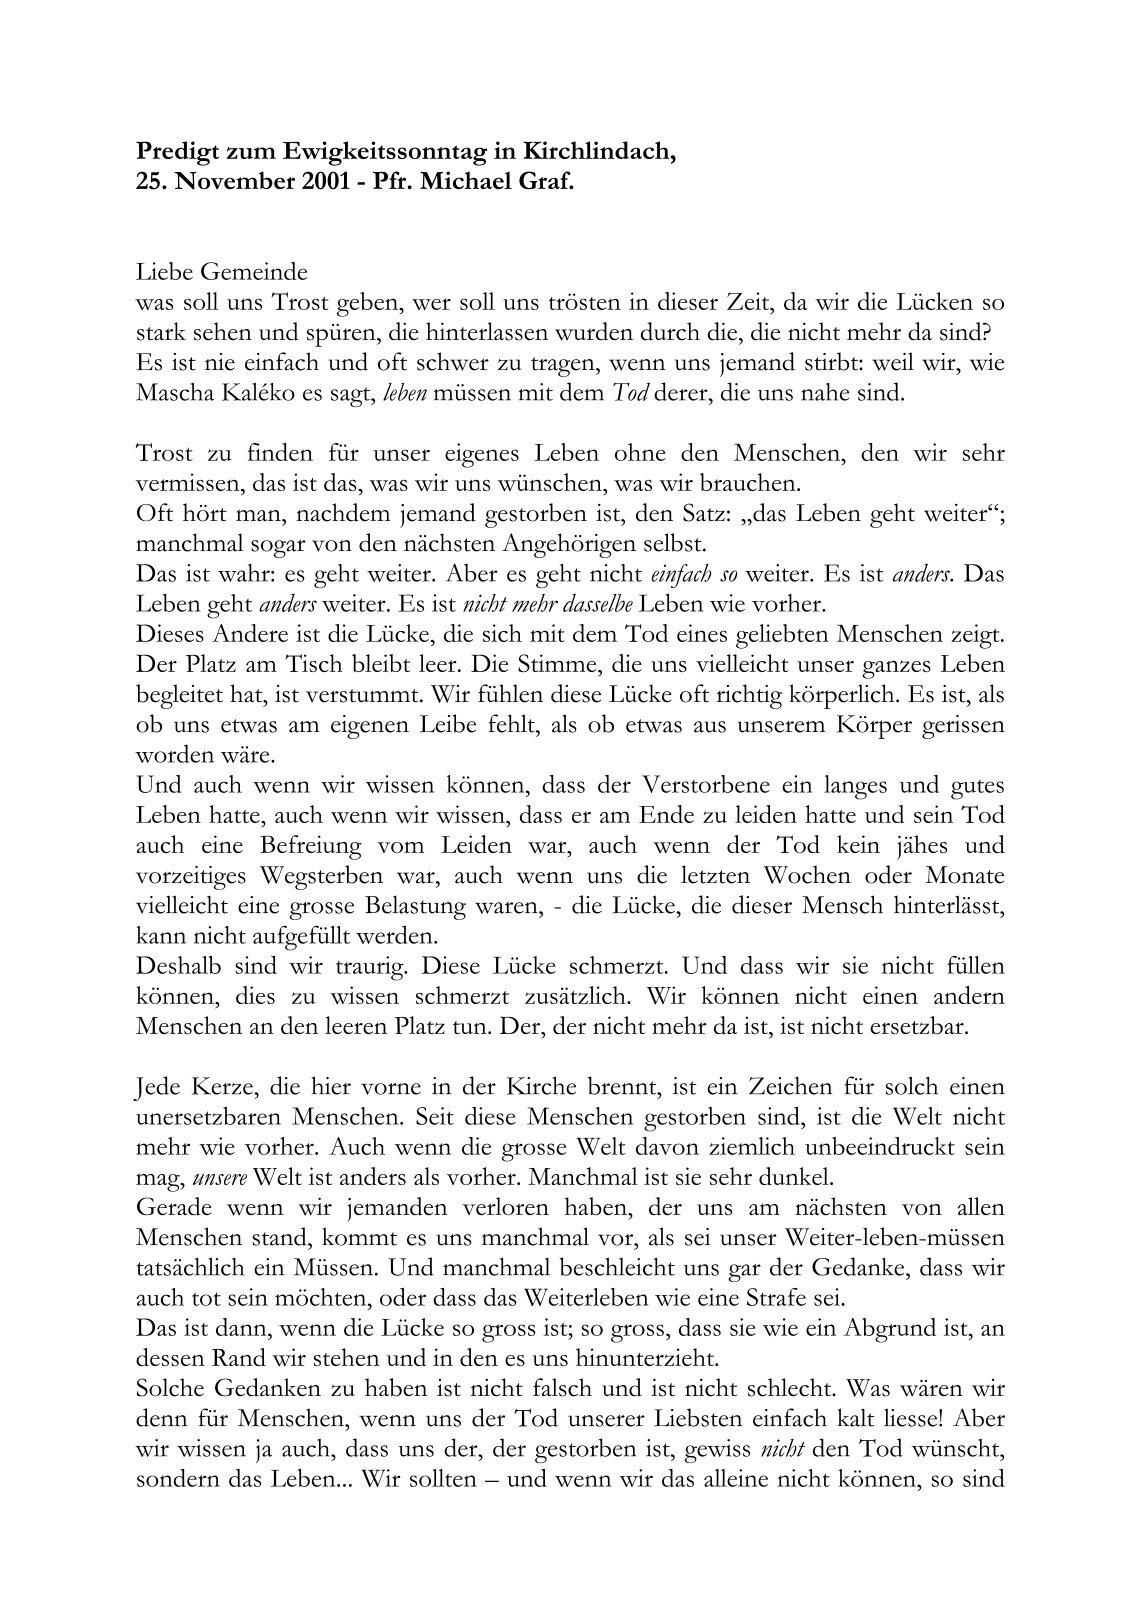 Traupredigt 1 kor 13 13